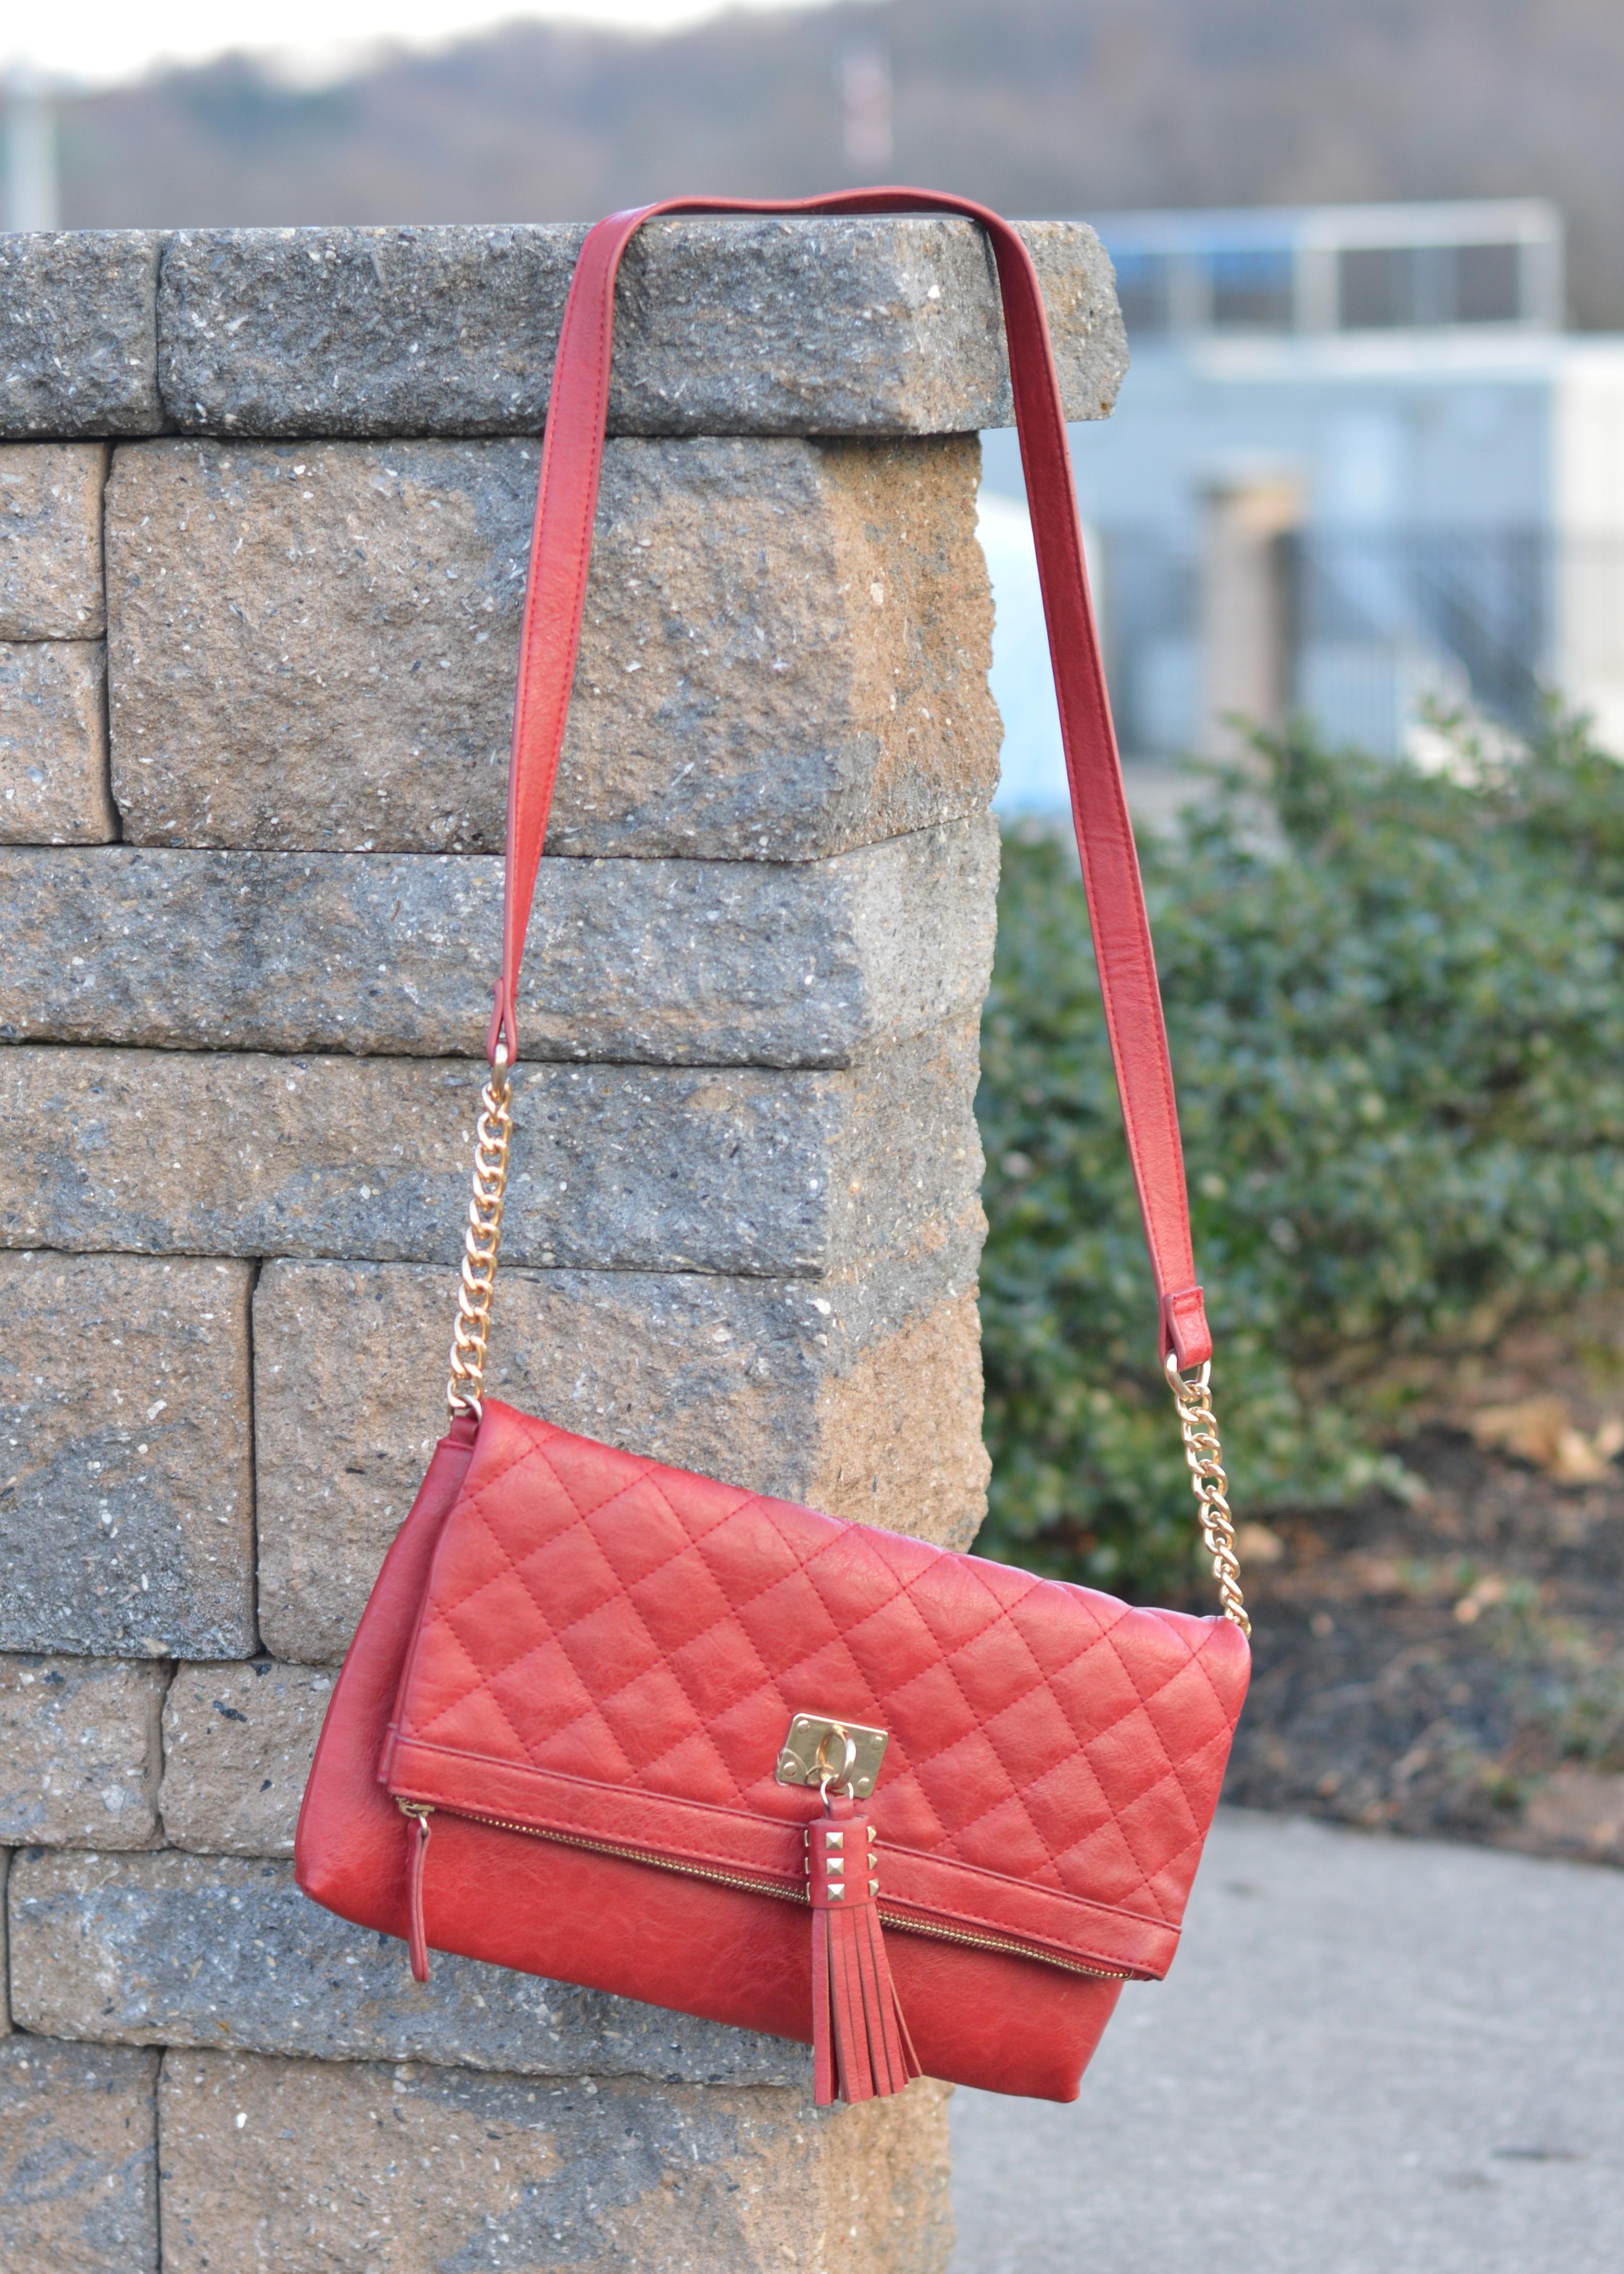 Zara Accessory SUMMER Clutch Teal Red Make Up Bag Statement Bold Travel